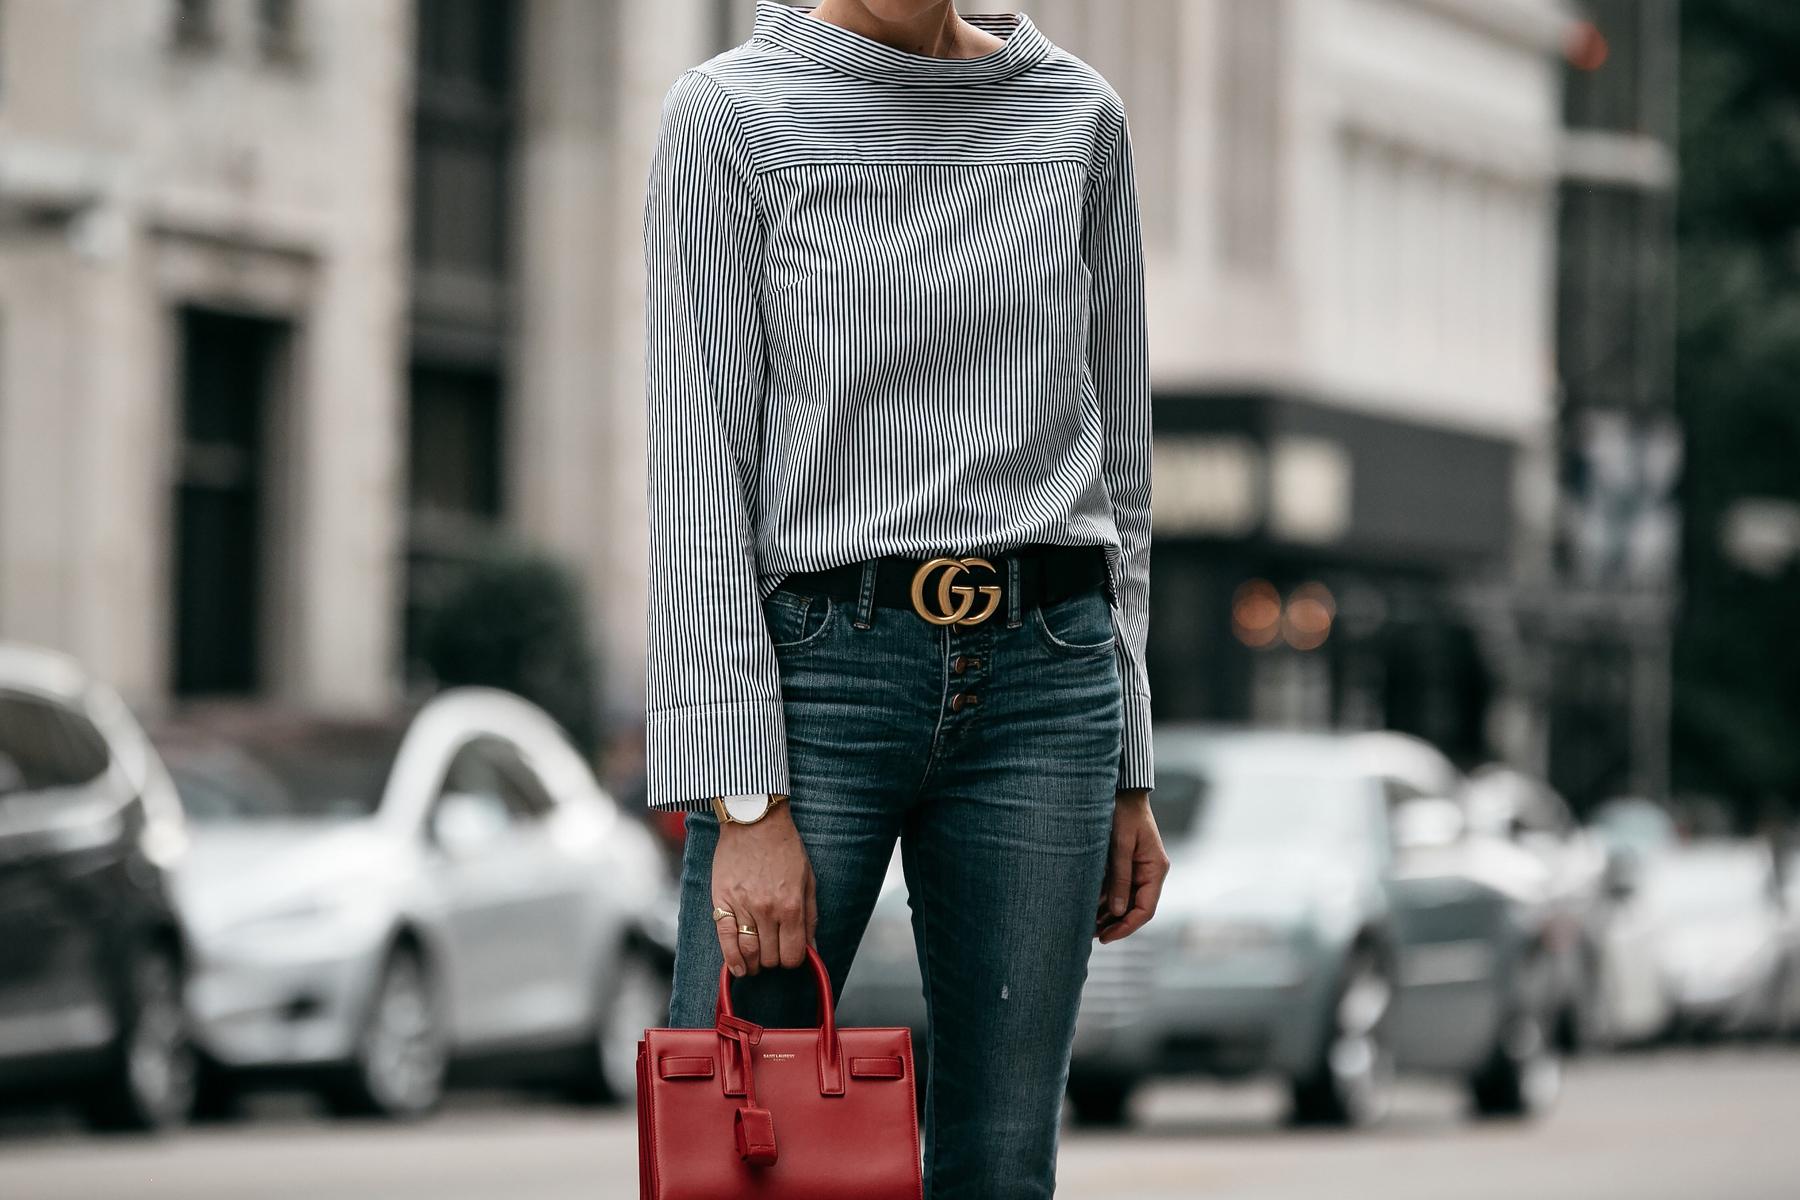 Jcrew Grey Striped Shirt Denim Skinny Jeans Gucci Belt Saint Laurent Sac De Jour Mini Red Fashion Jackson Dallas Blogger Fashion Blogger Street Style